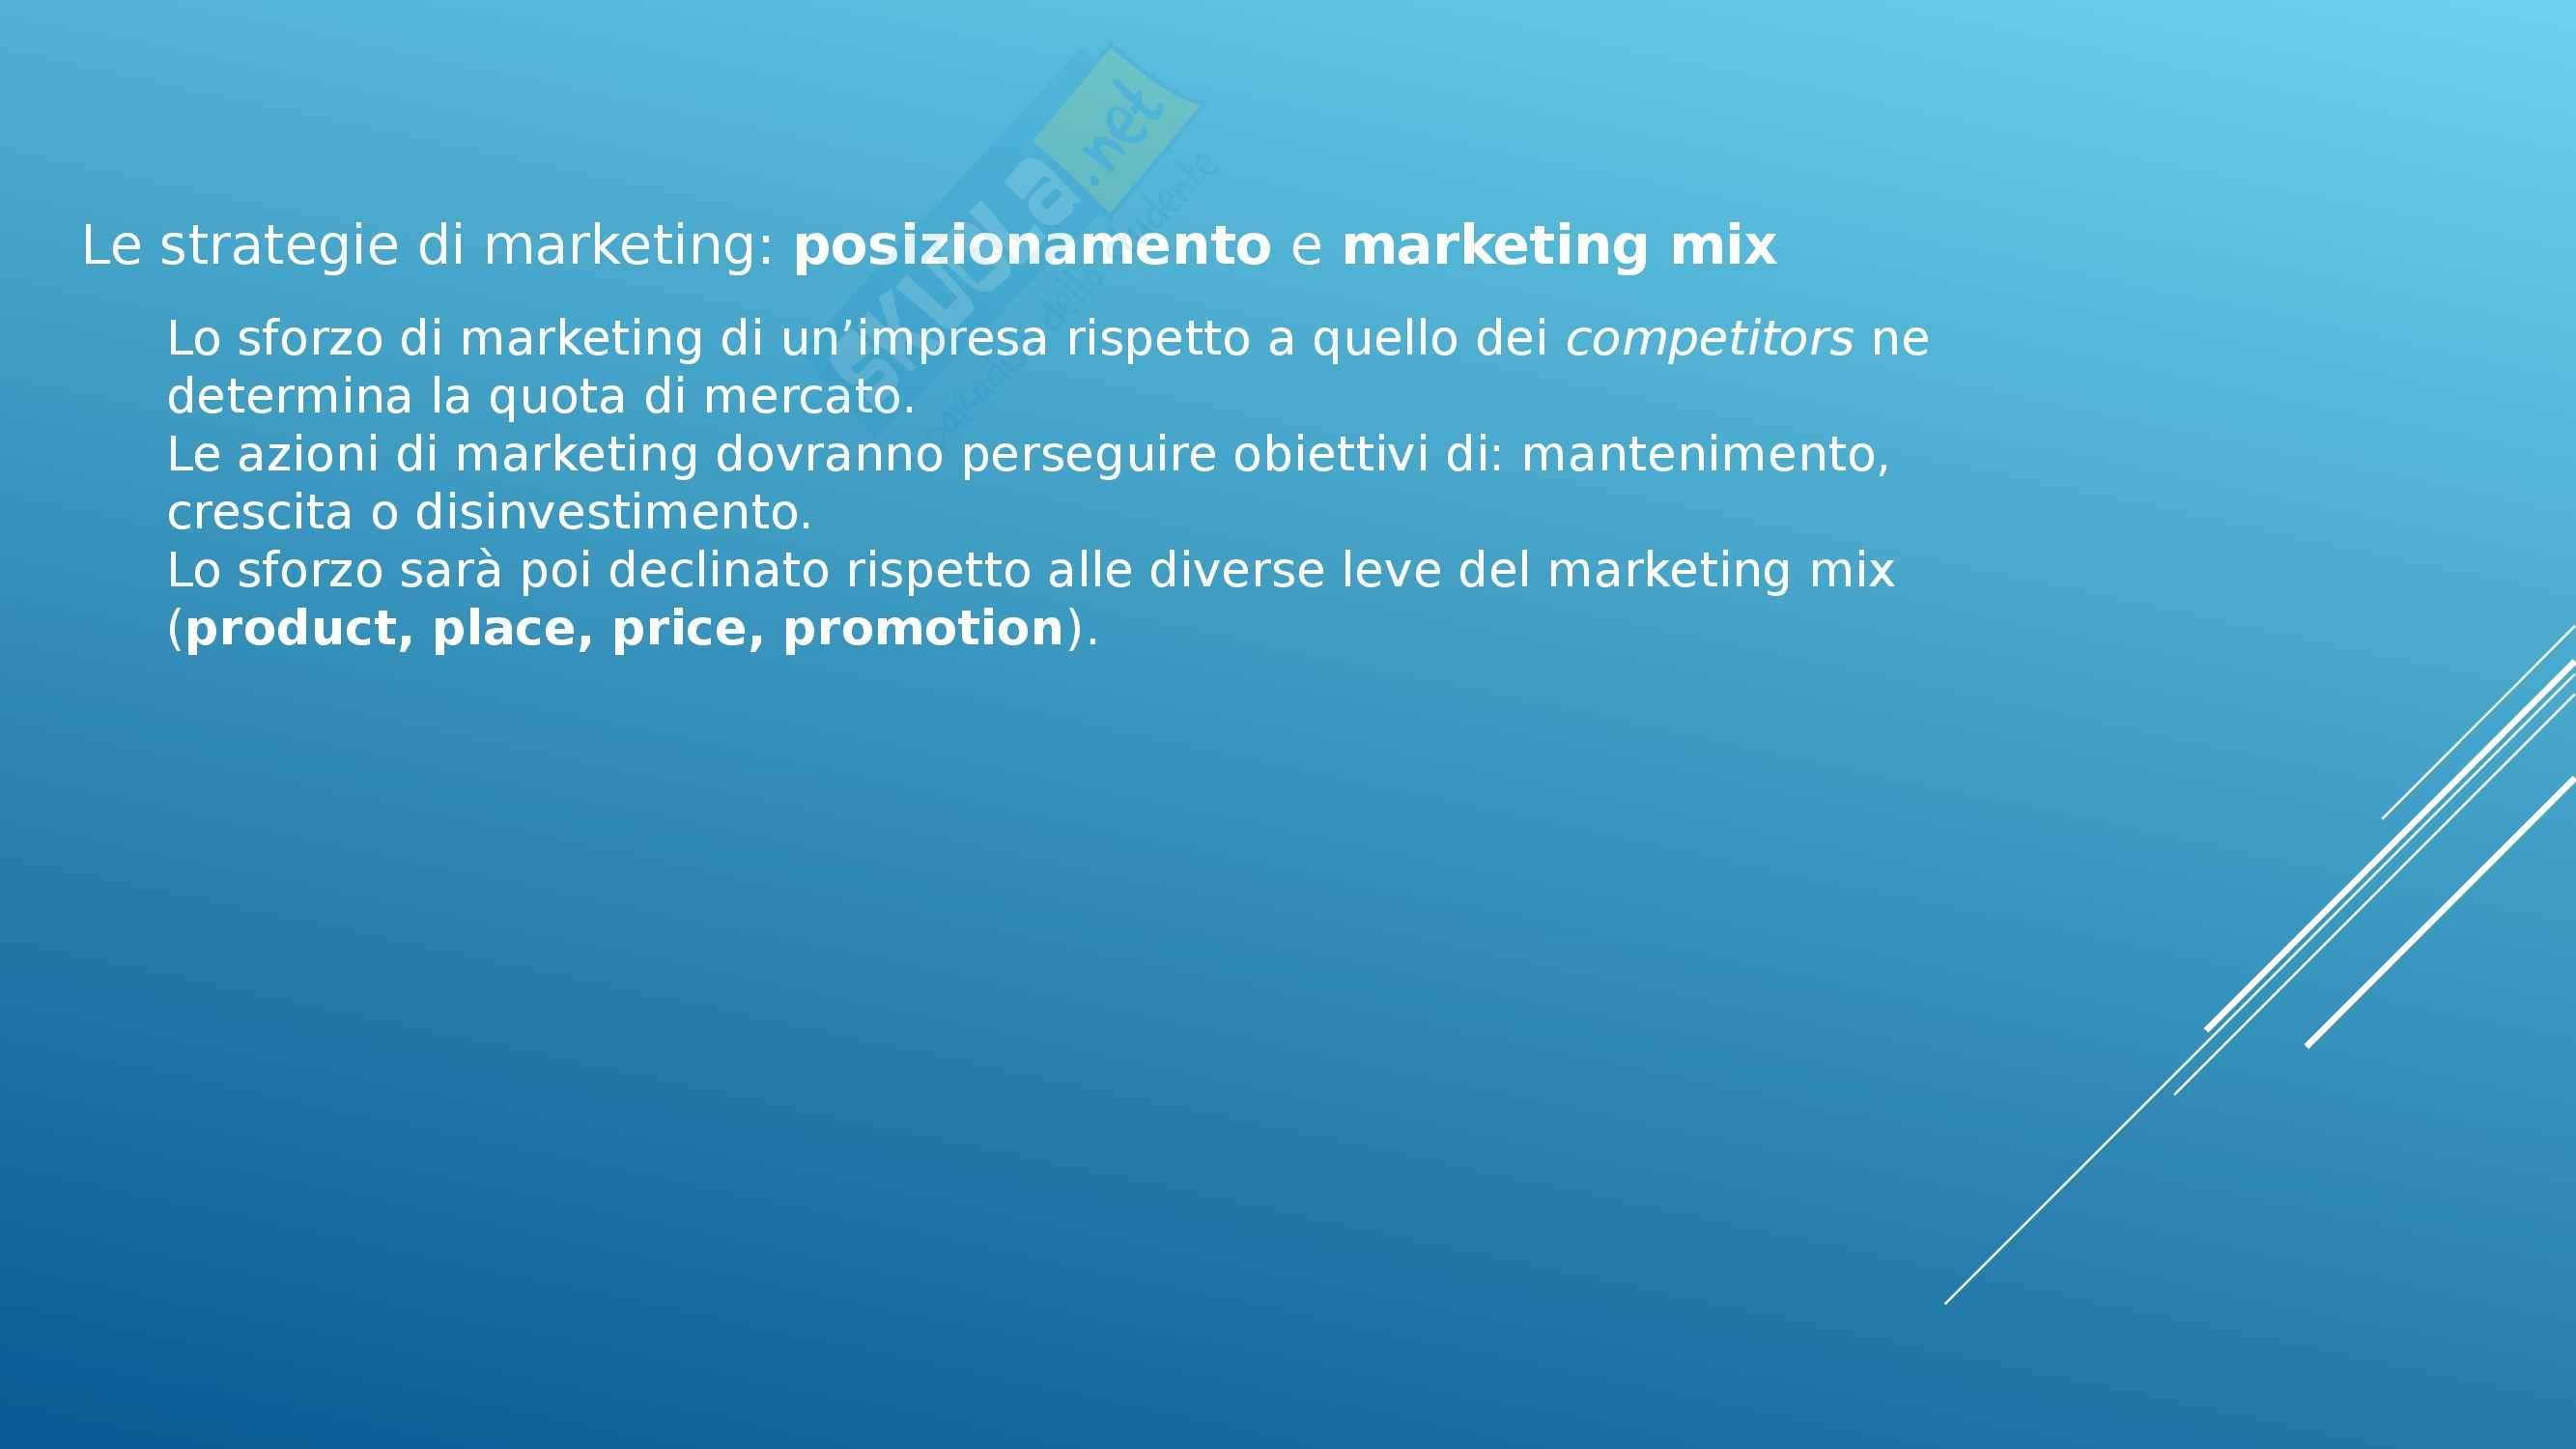 Riassunto esame Gestione Aziendale: Marketing, prof. Spina Pag. 36